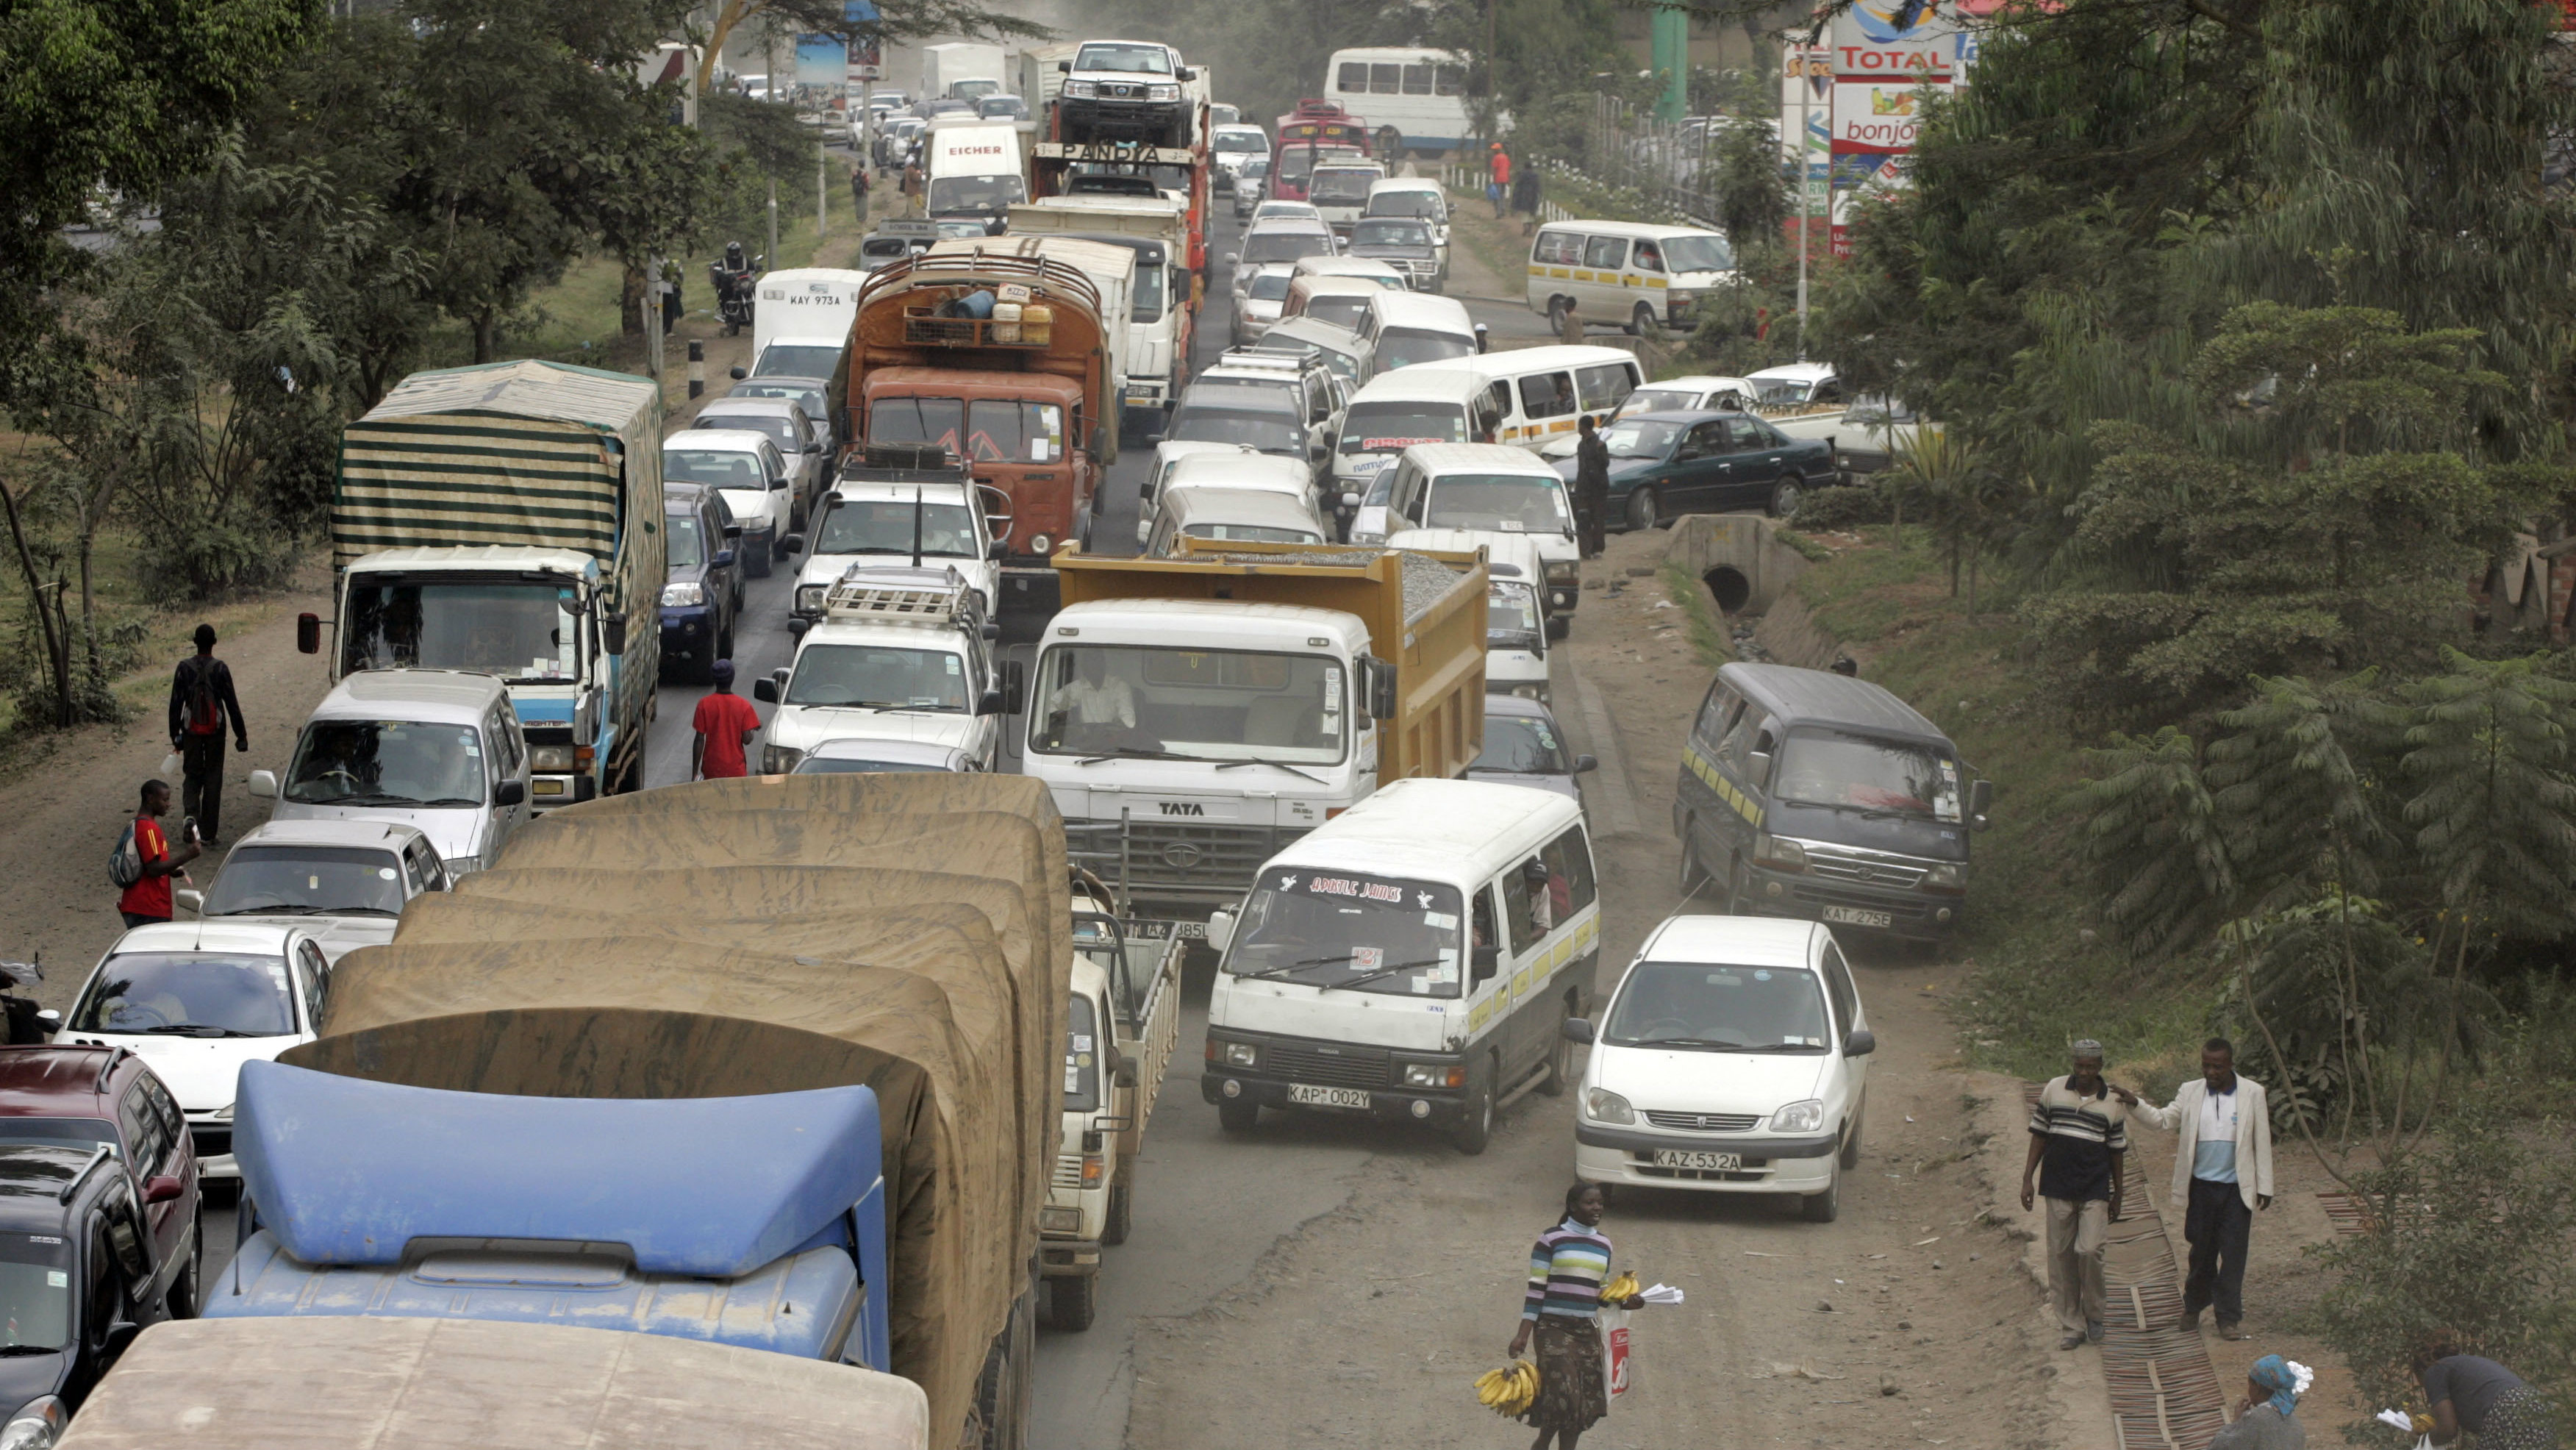 Traffic works its way down a busy Naiorbi, Kenya road June 23, 2008. (AP Photo/Sayyid Azim